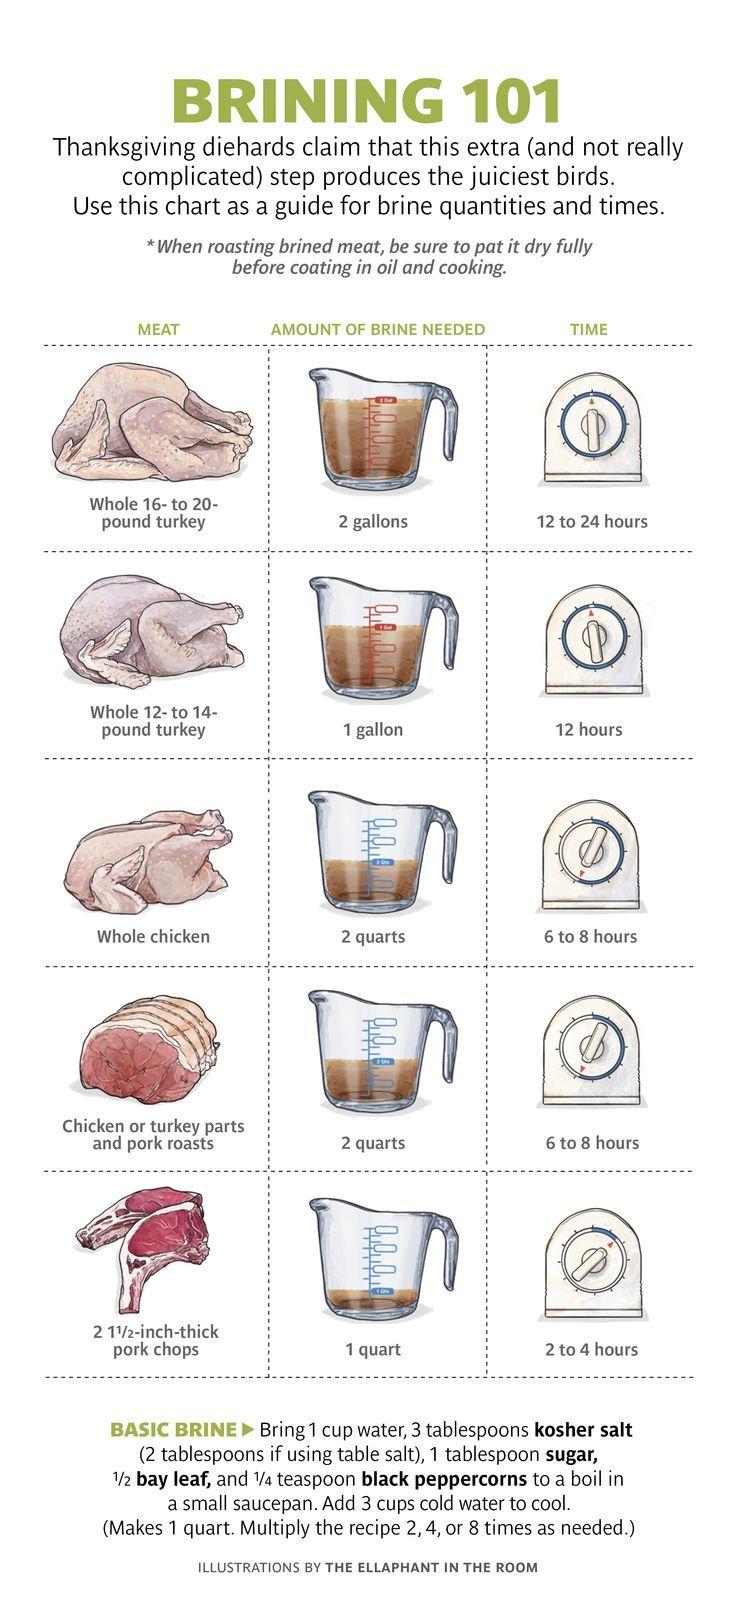 Guidelines for brining turkey, chicken and pork. (scheduled via http://www.tailwindapp.com?utm_source=pinterest&utm_medium=twpin&utm_content=post12409988&utm_campaign=scheduler_attribution)